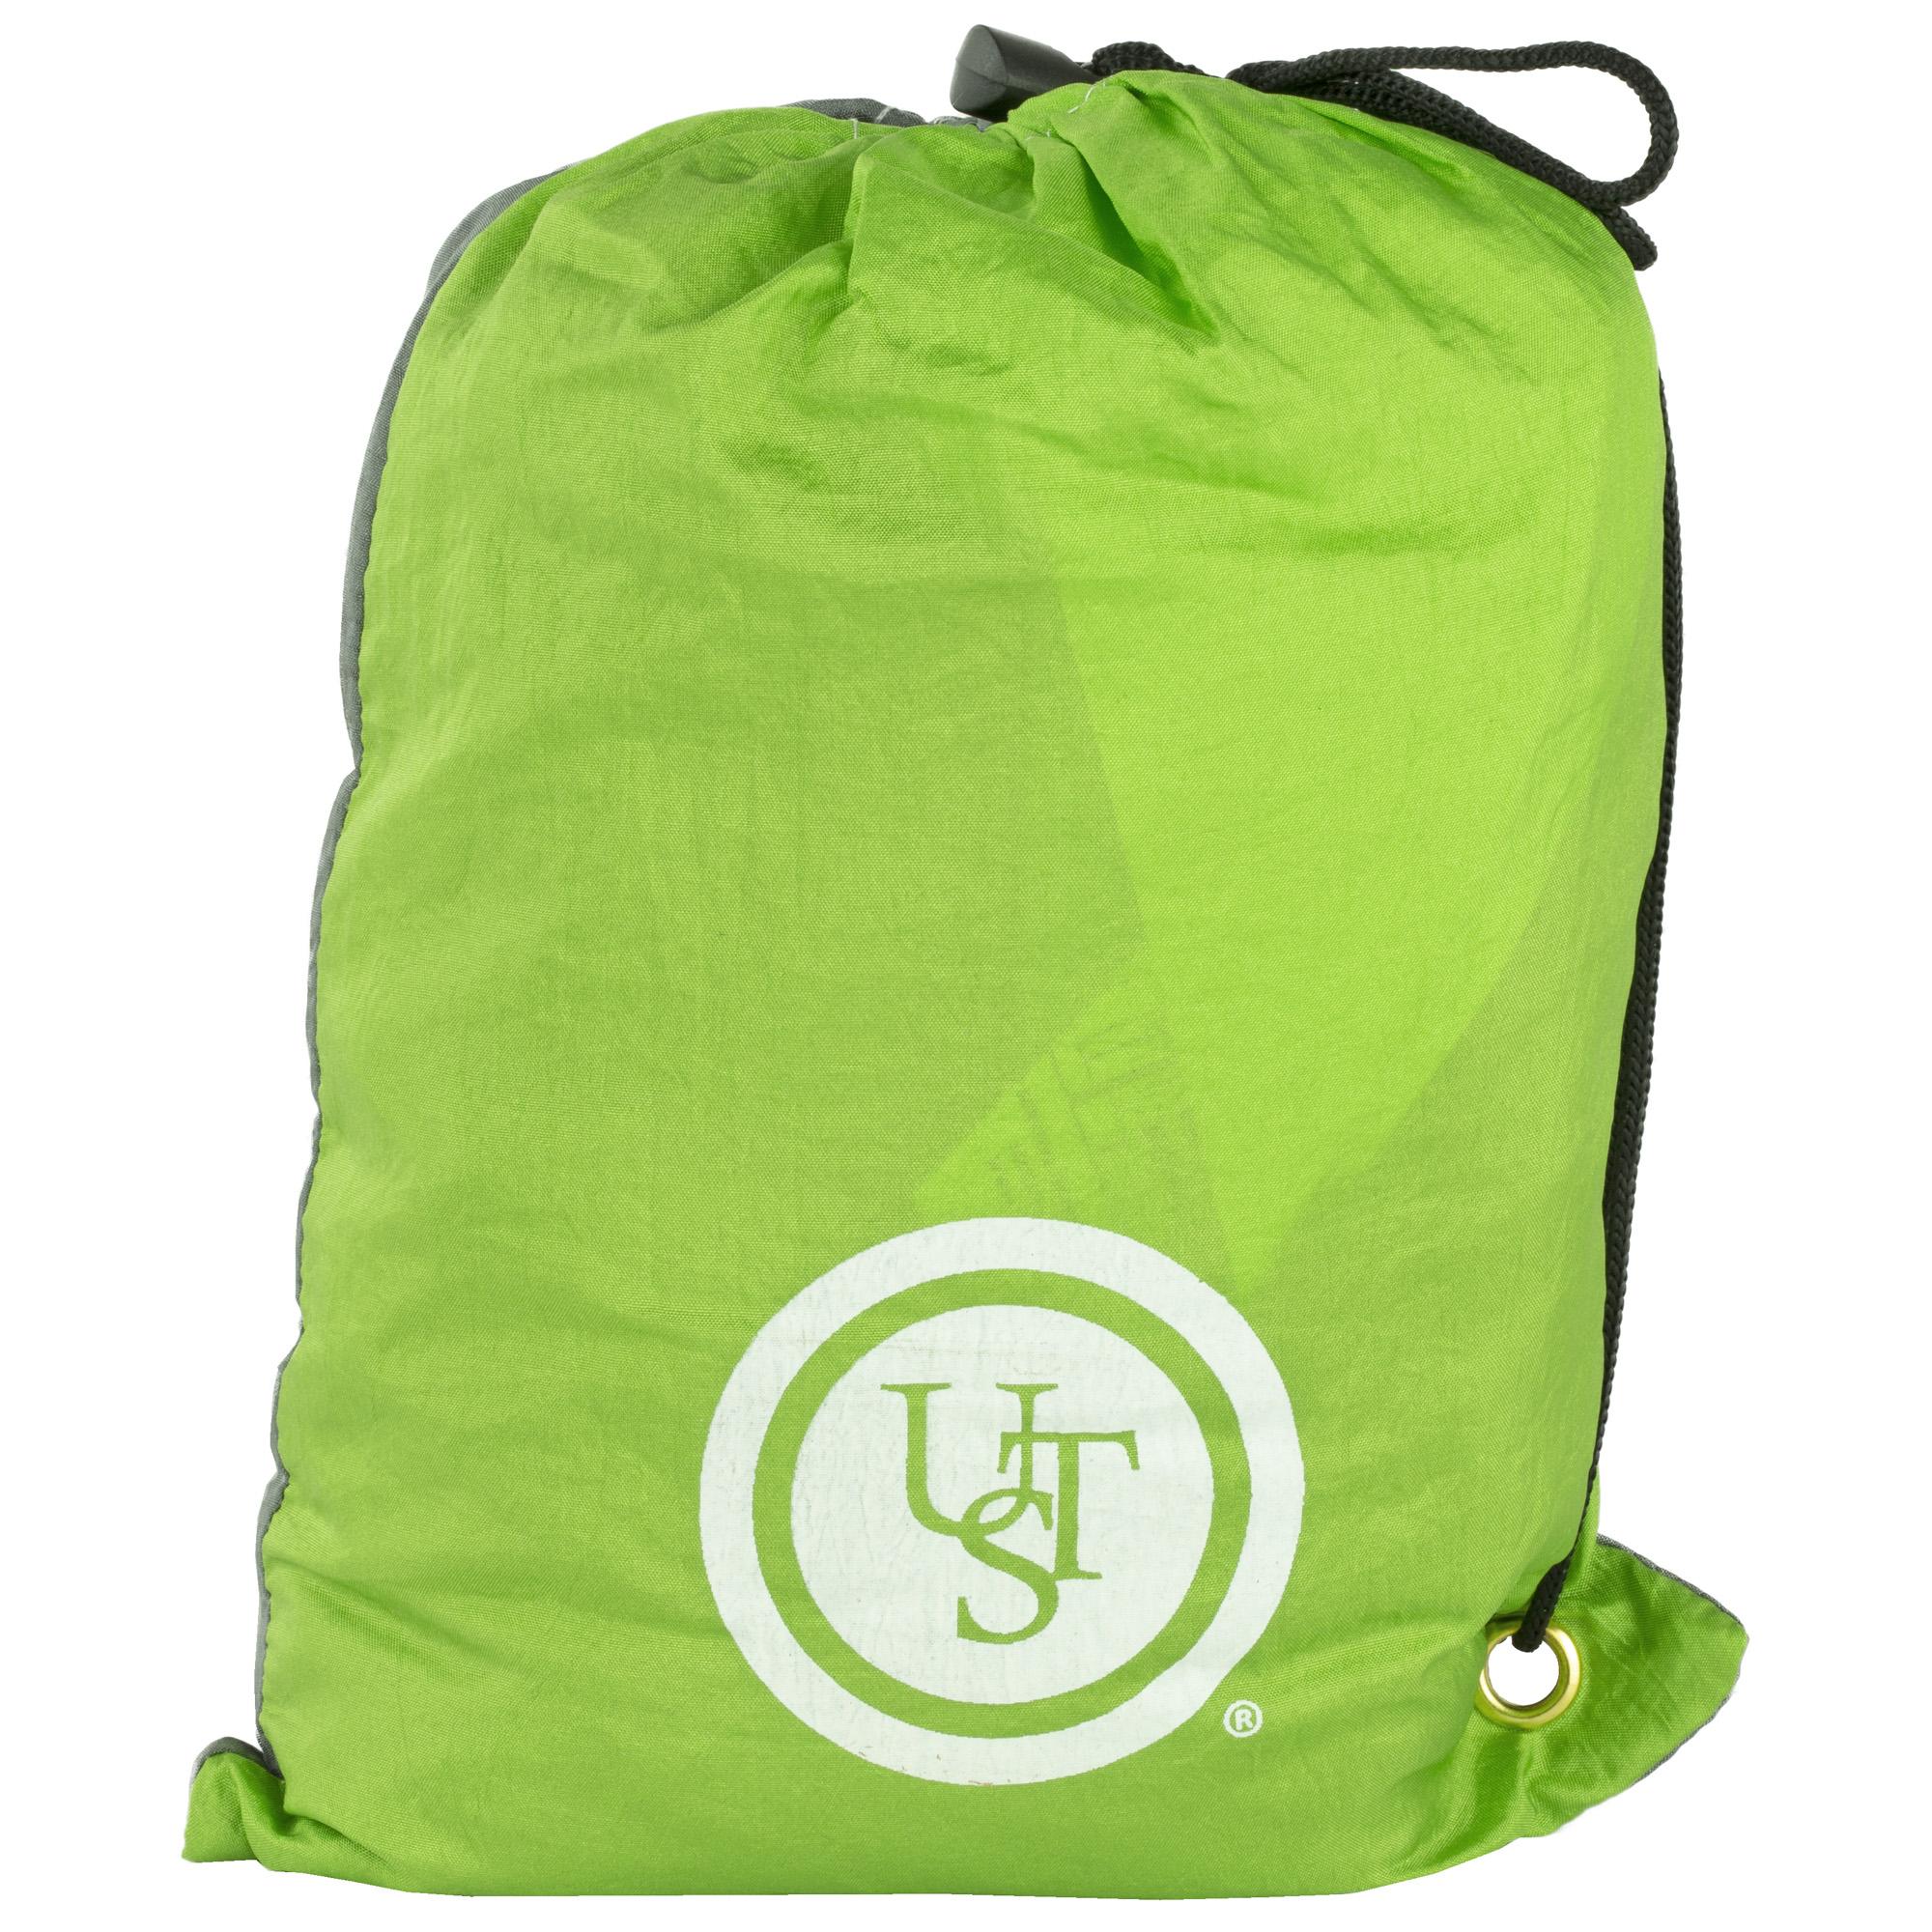 Ust Slothcloth Hammock 1.0  Lime/gry